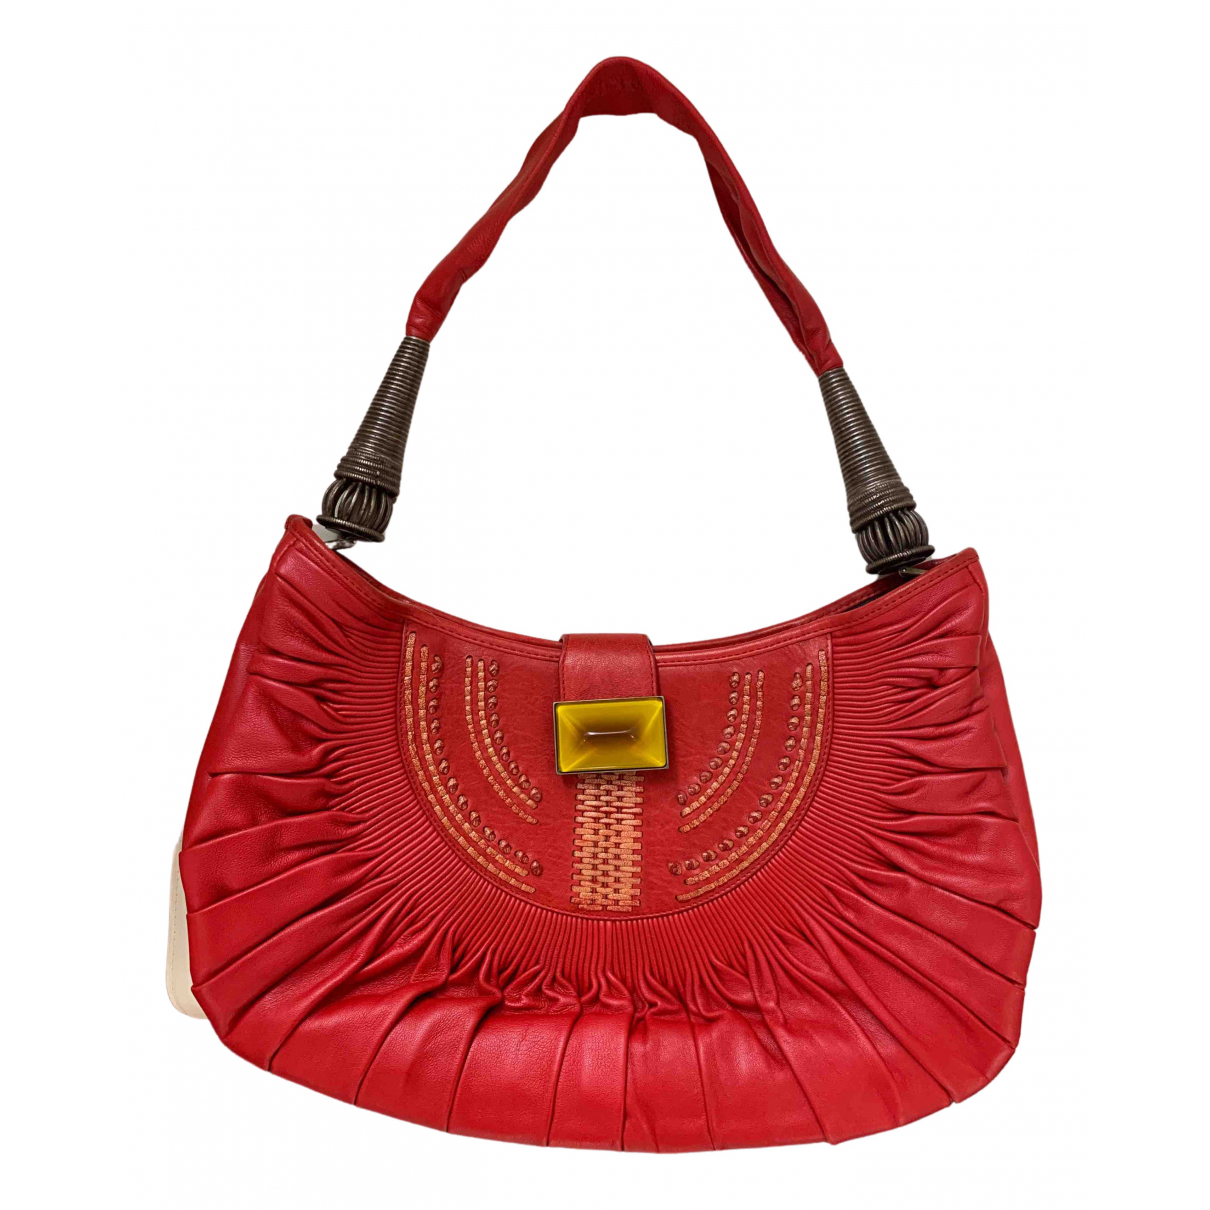 Dior - Sac a main   pour femme en cuir - rouge